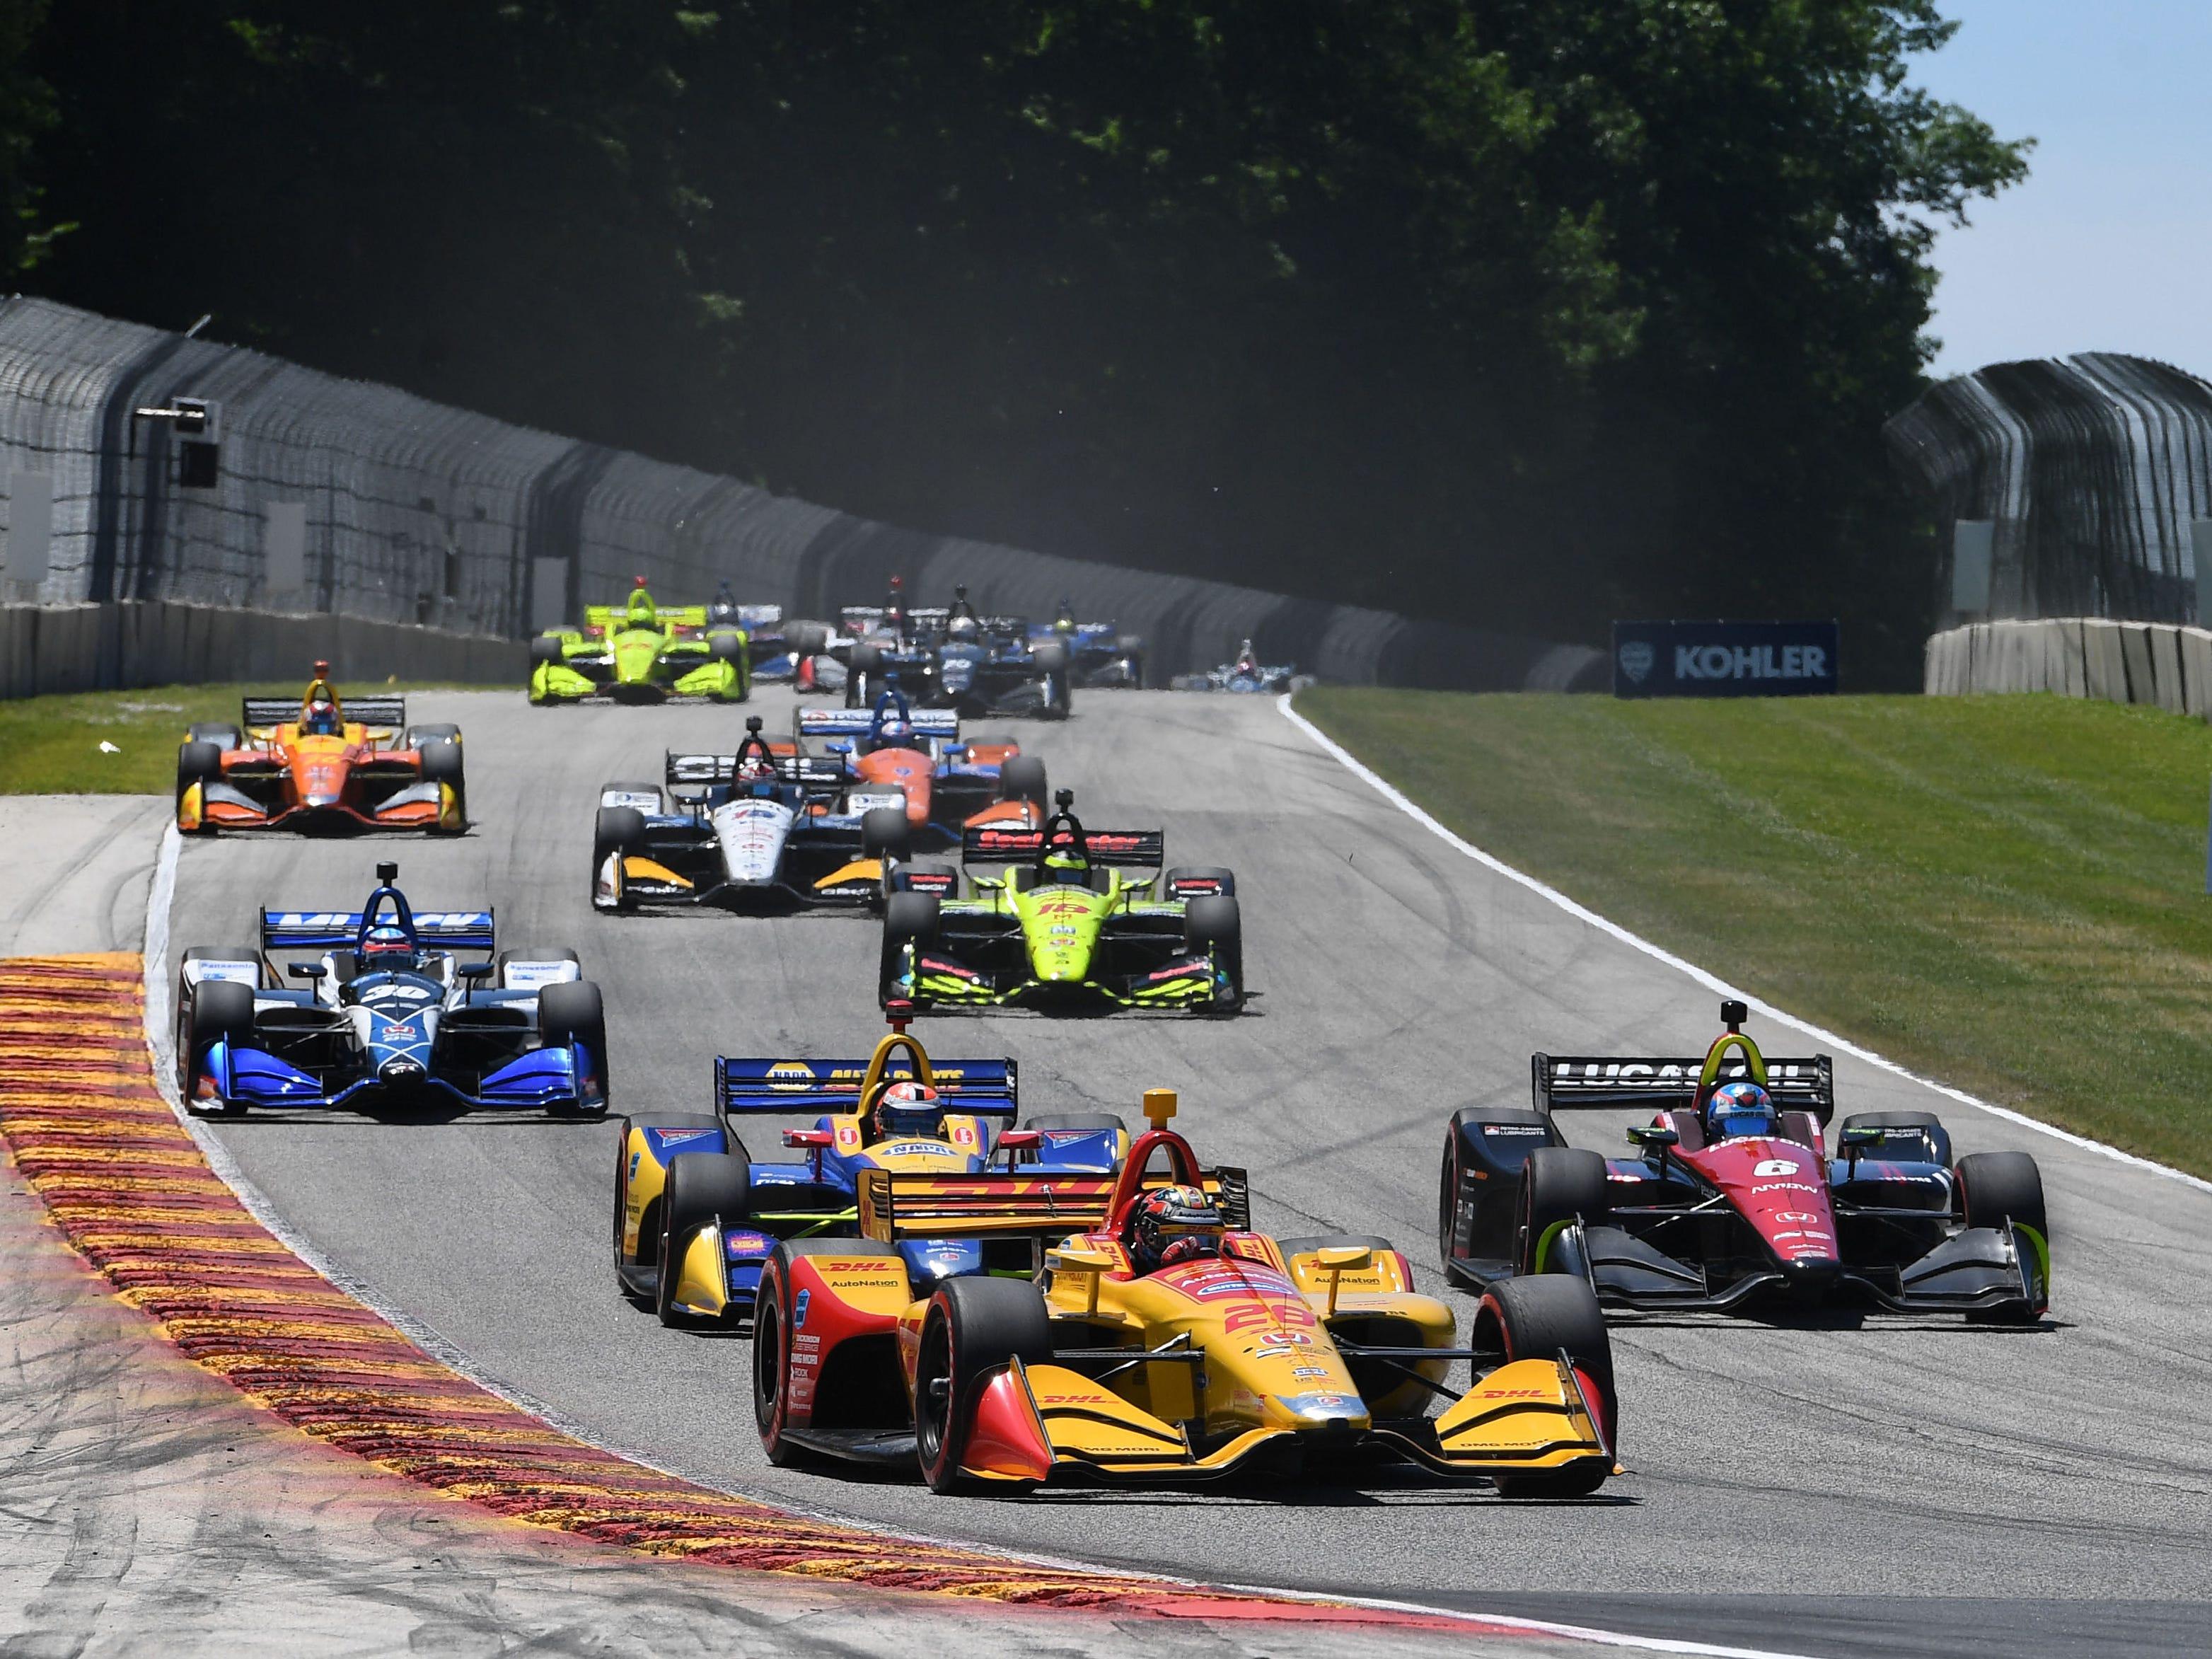 2019 NTT IndyCar Series schedule